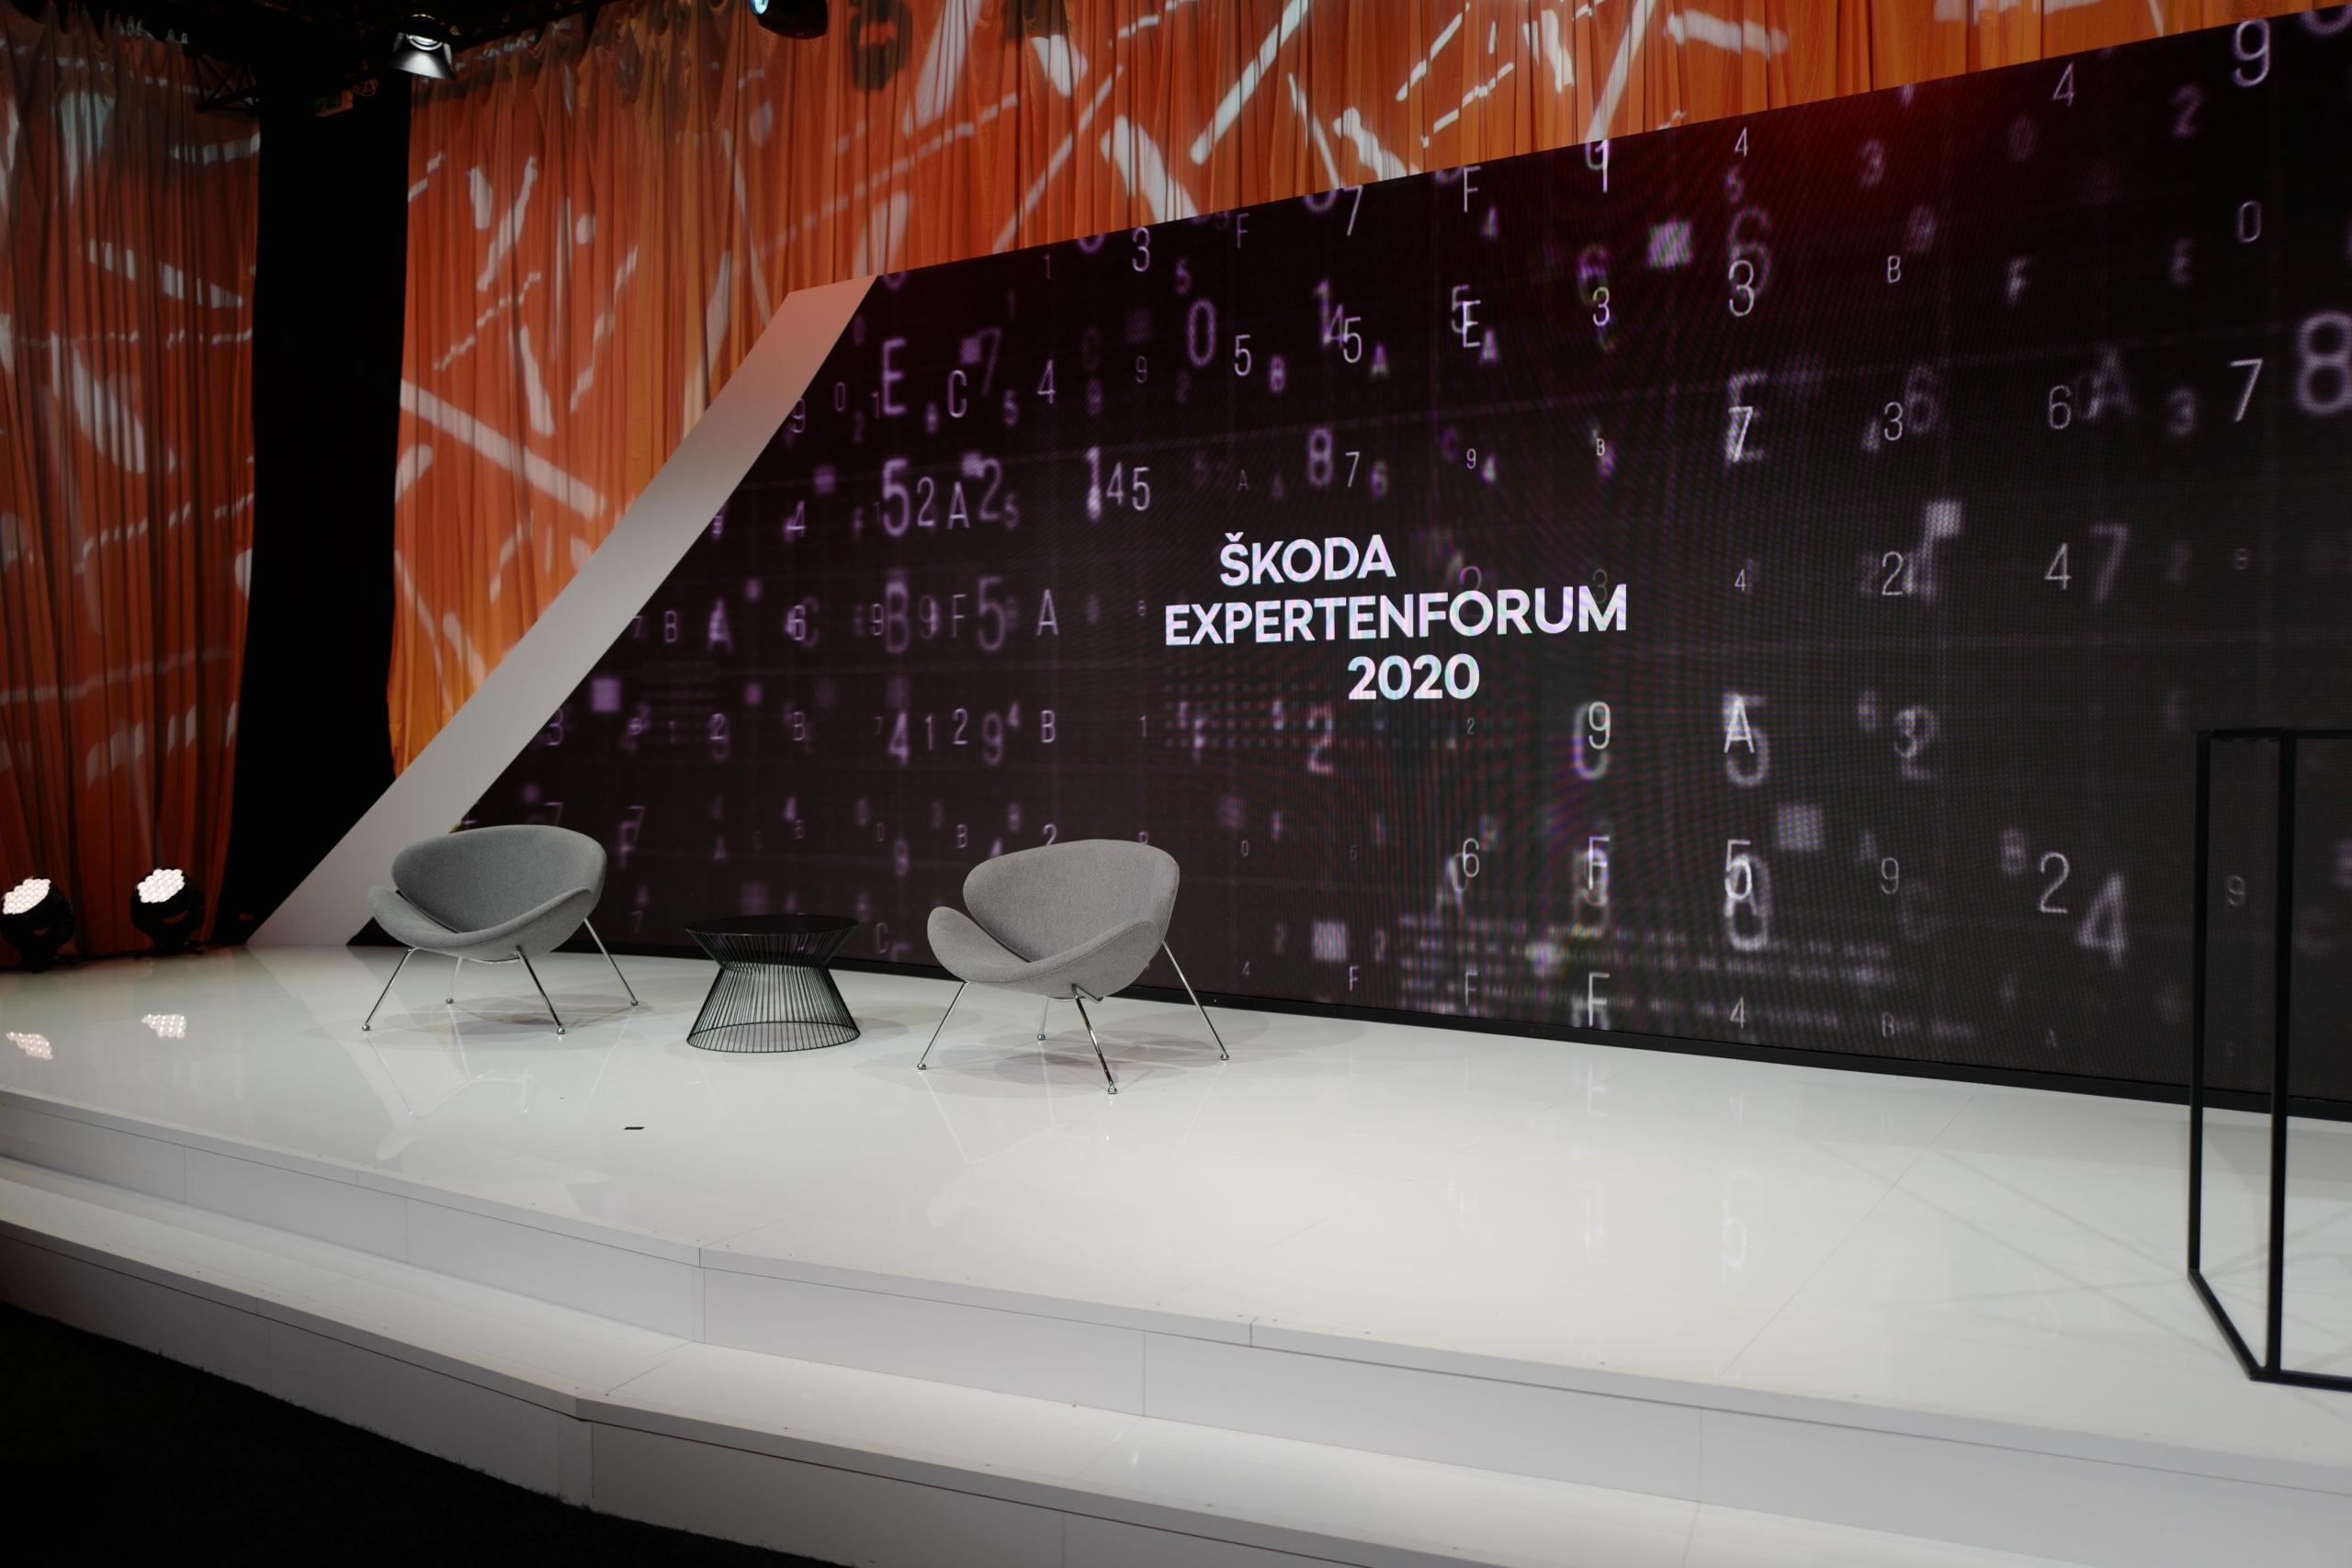 SKODA EXPERTENFORUM 2020